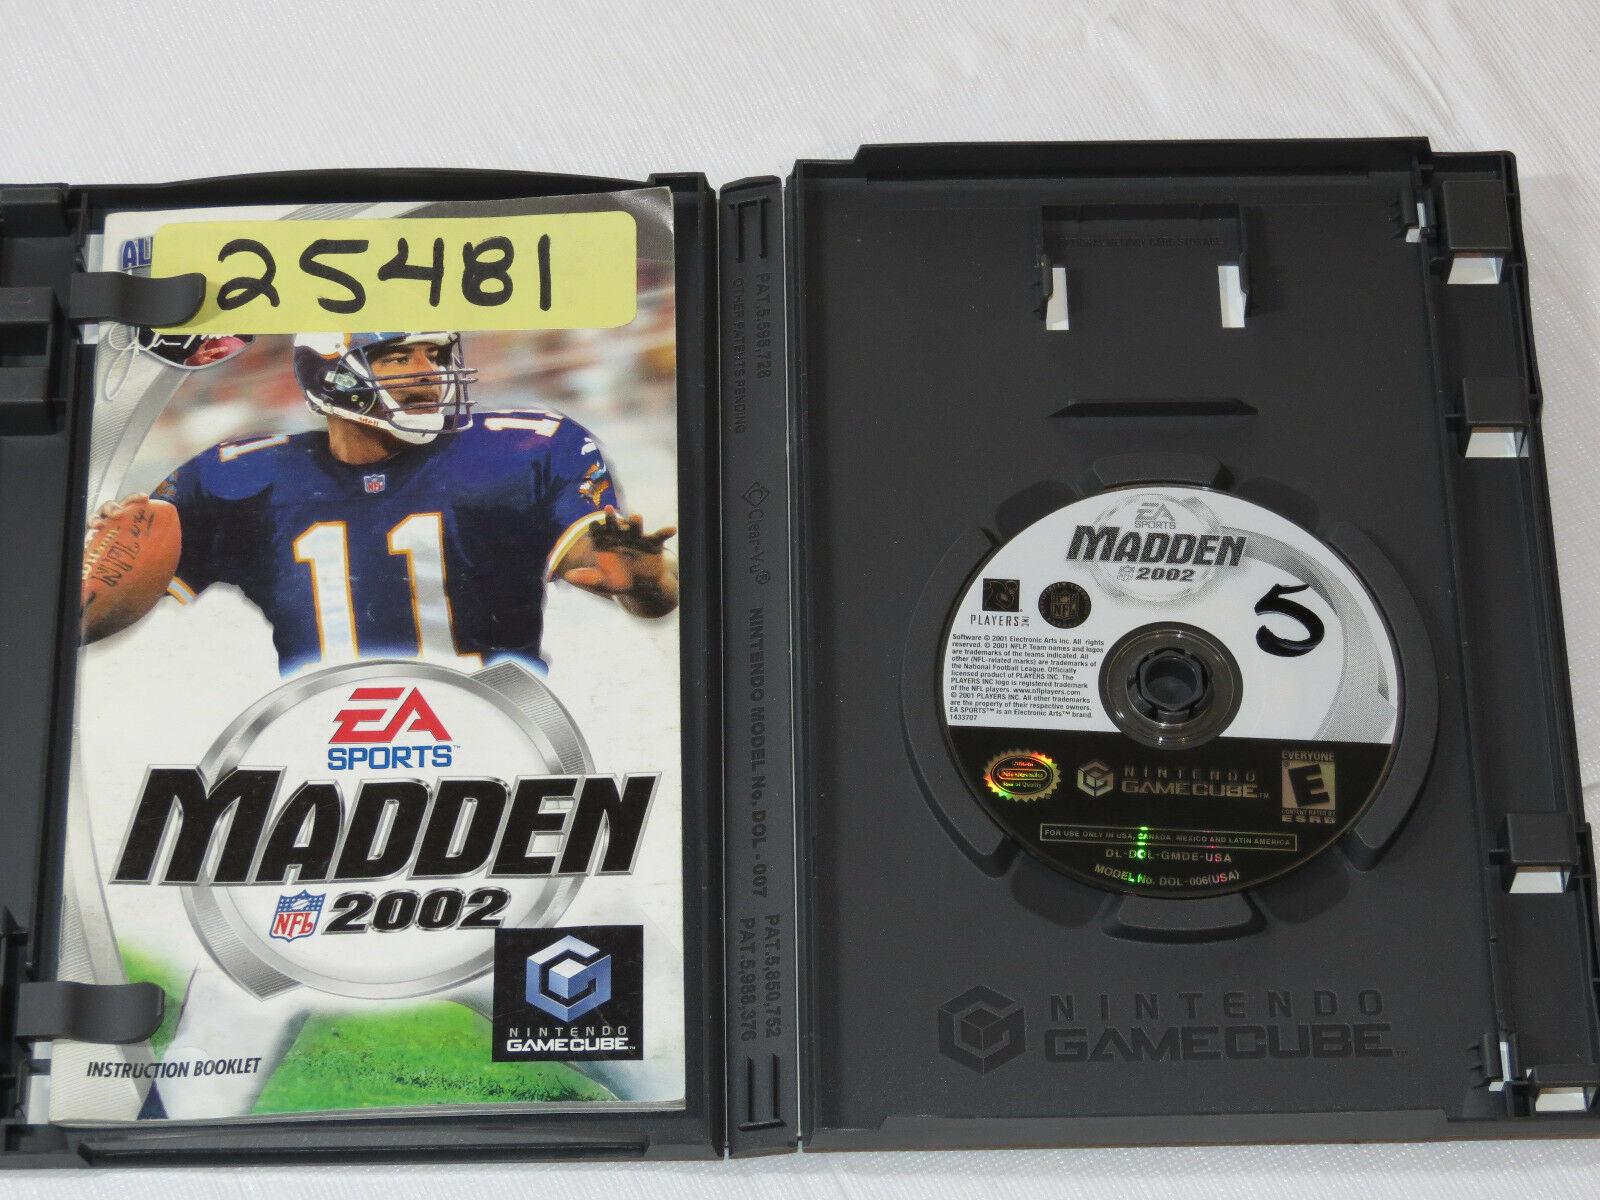 Enloquecer NFL 2002 Nintendo Gamecube 2001 Fútbol Videojuego E-Everyone 25481 image 4